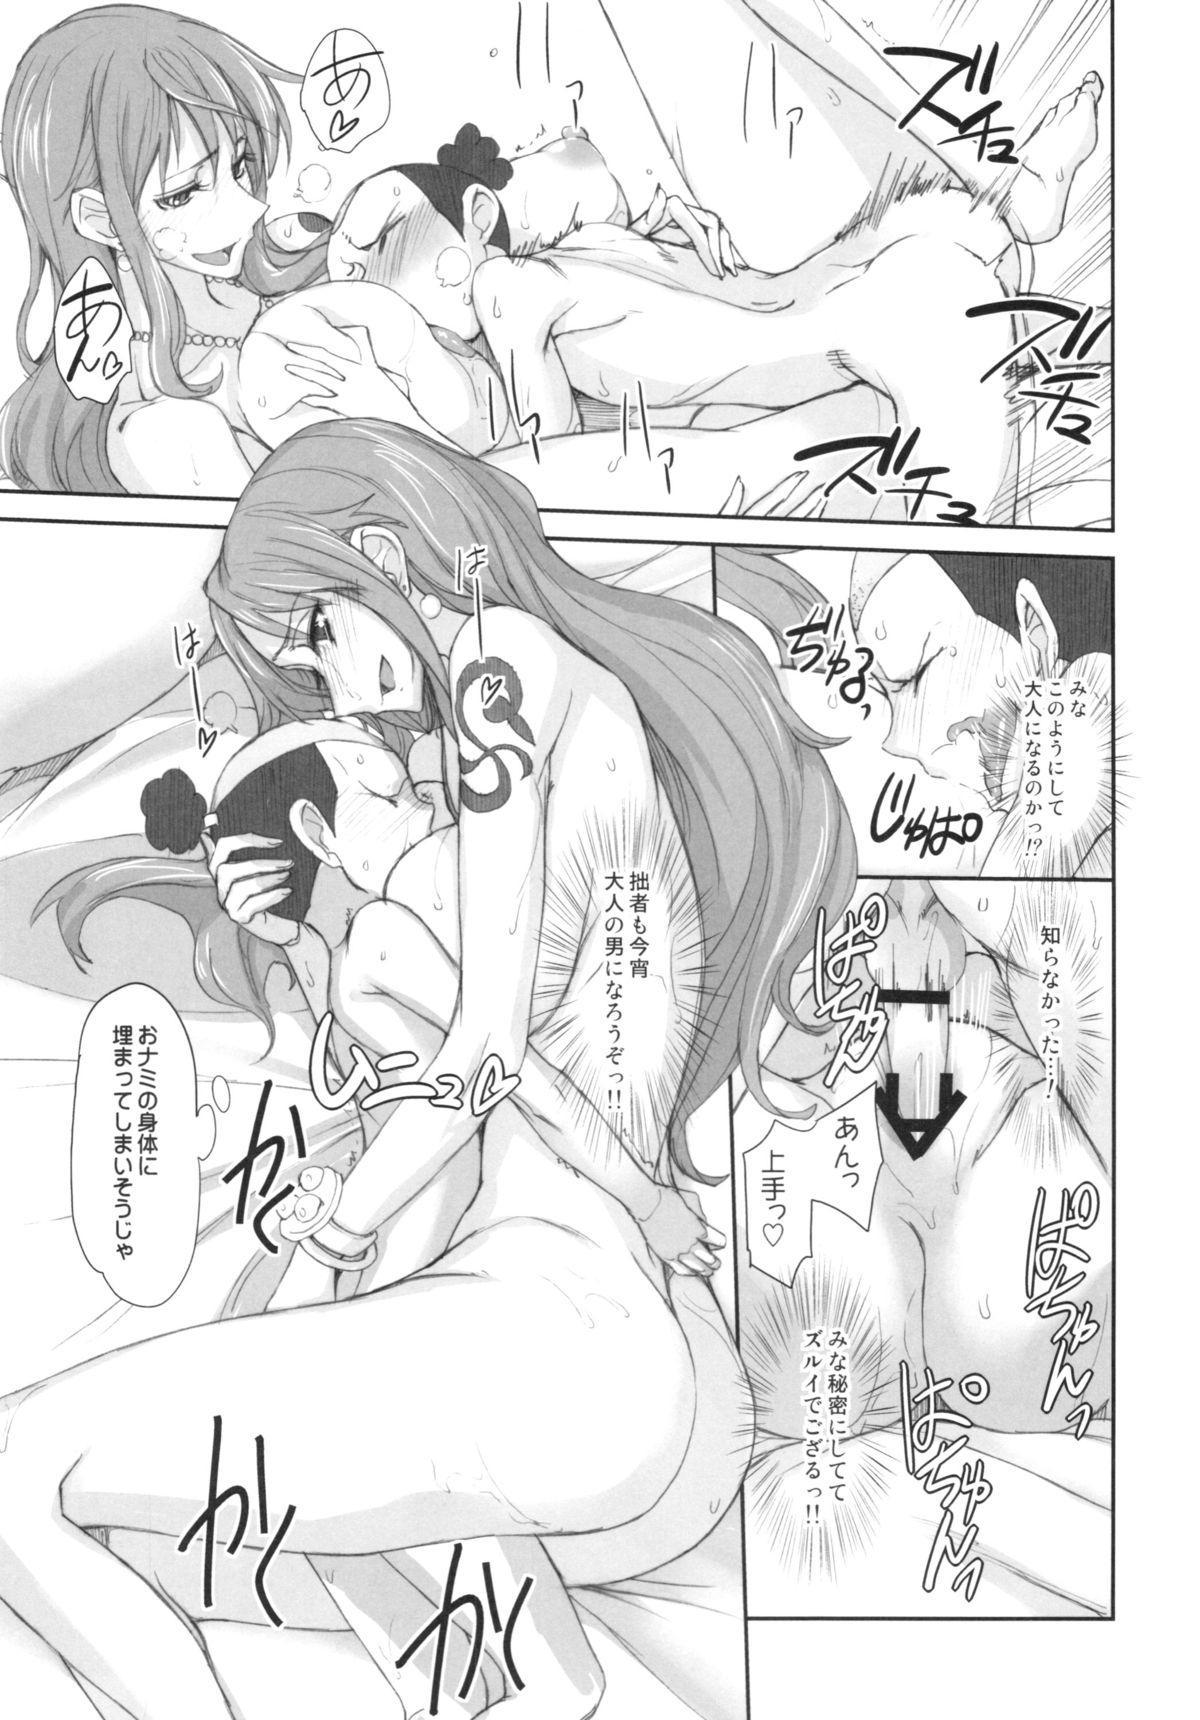 Grandline Chronicle 3 Momo ☆ Momo 12